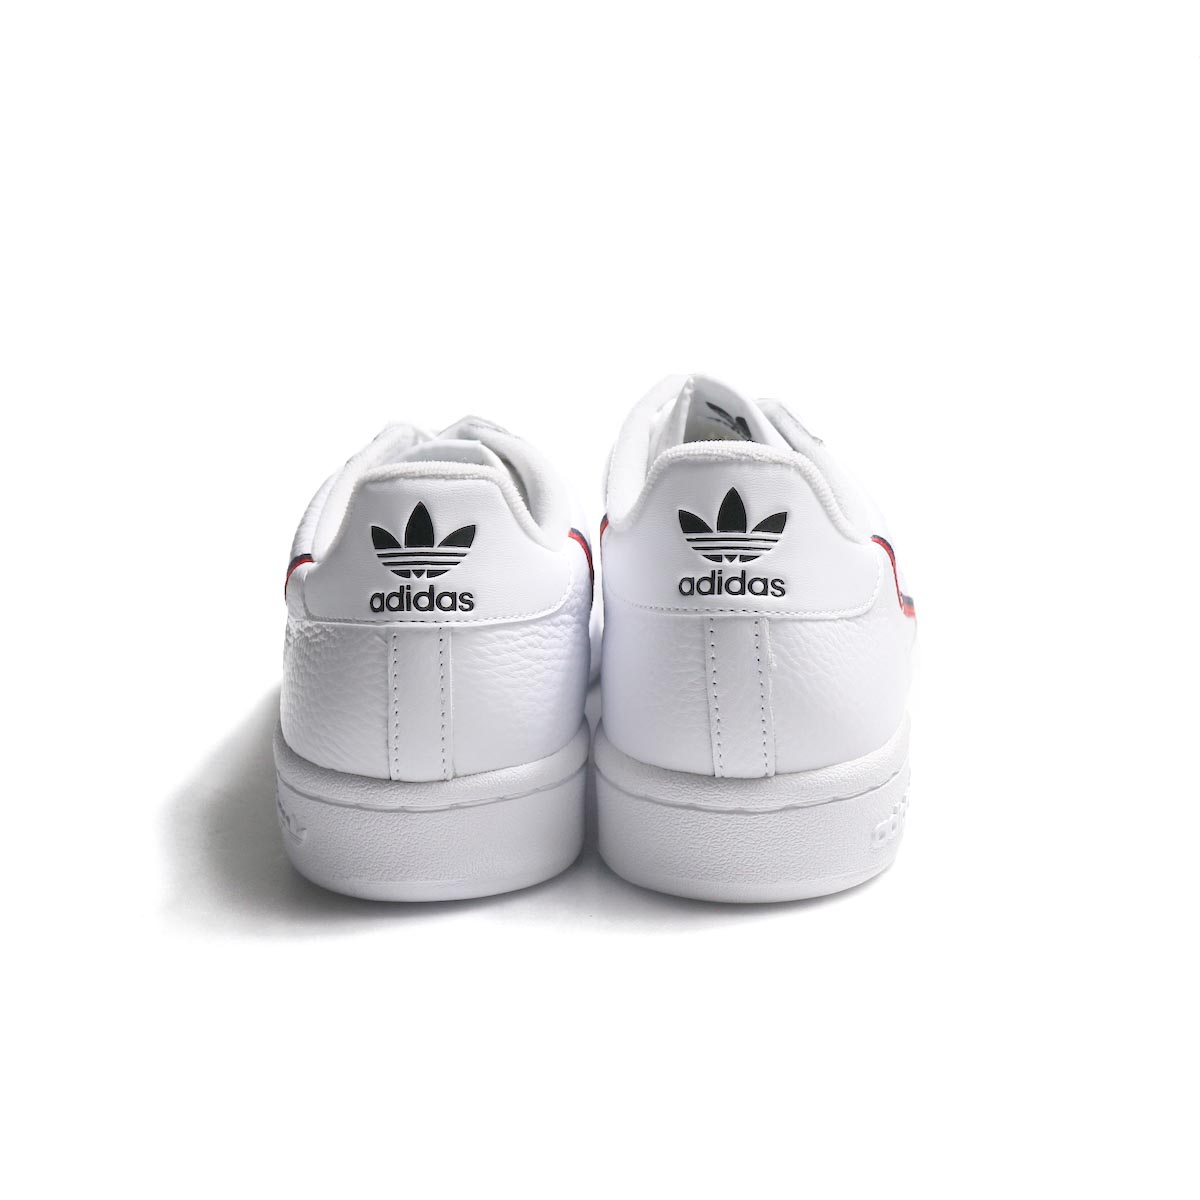 adidas originals / CONTINENTAL80 (G27706) -White 背面